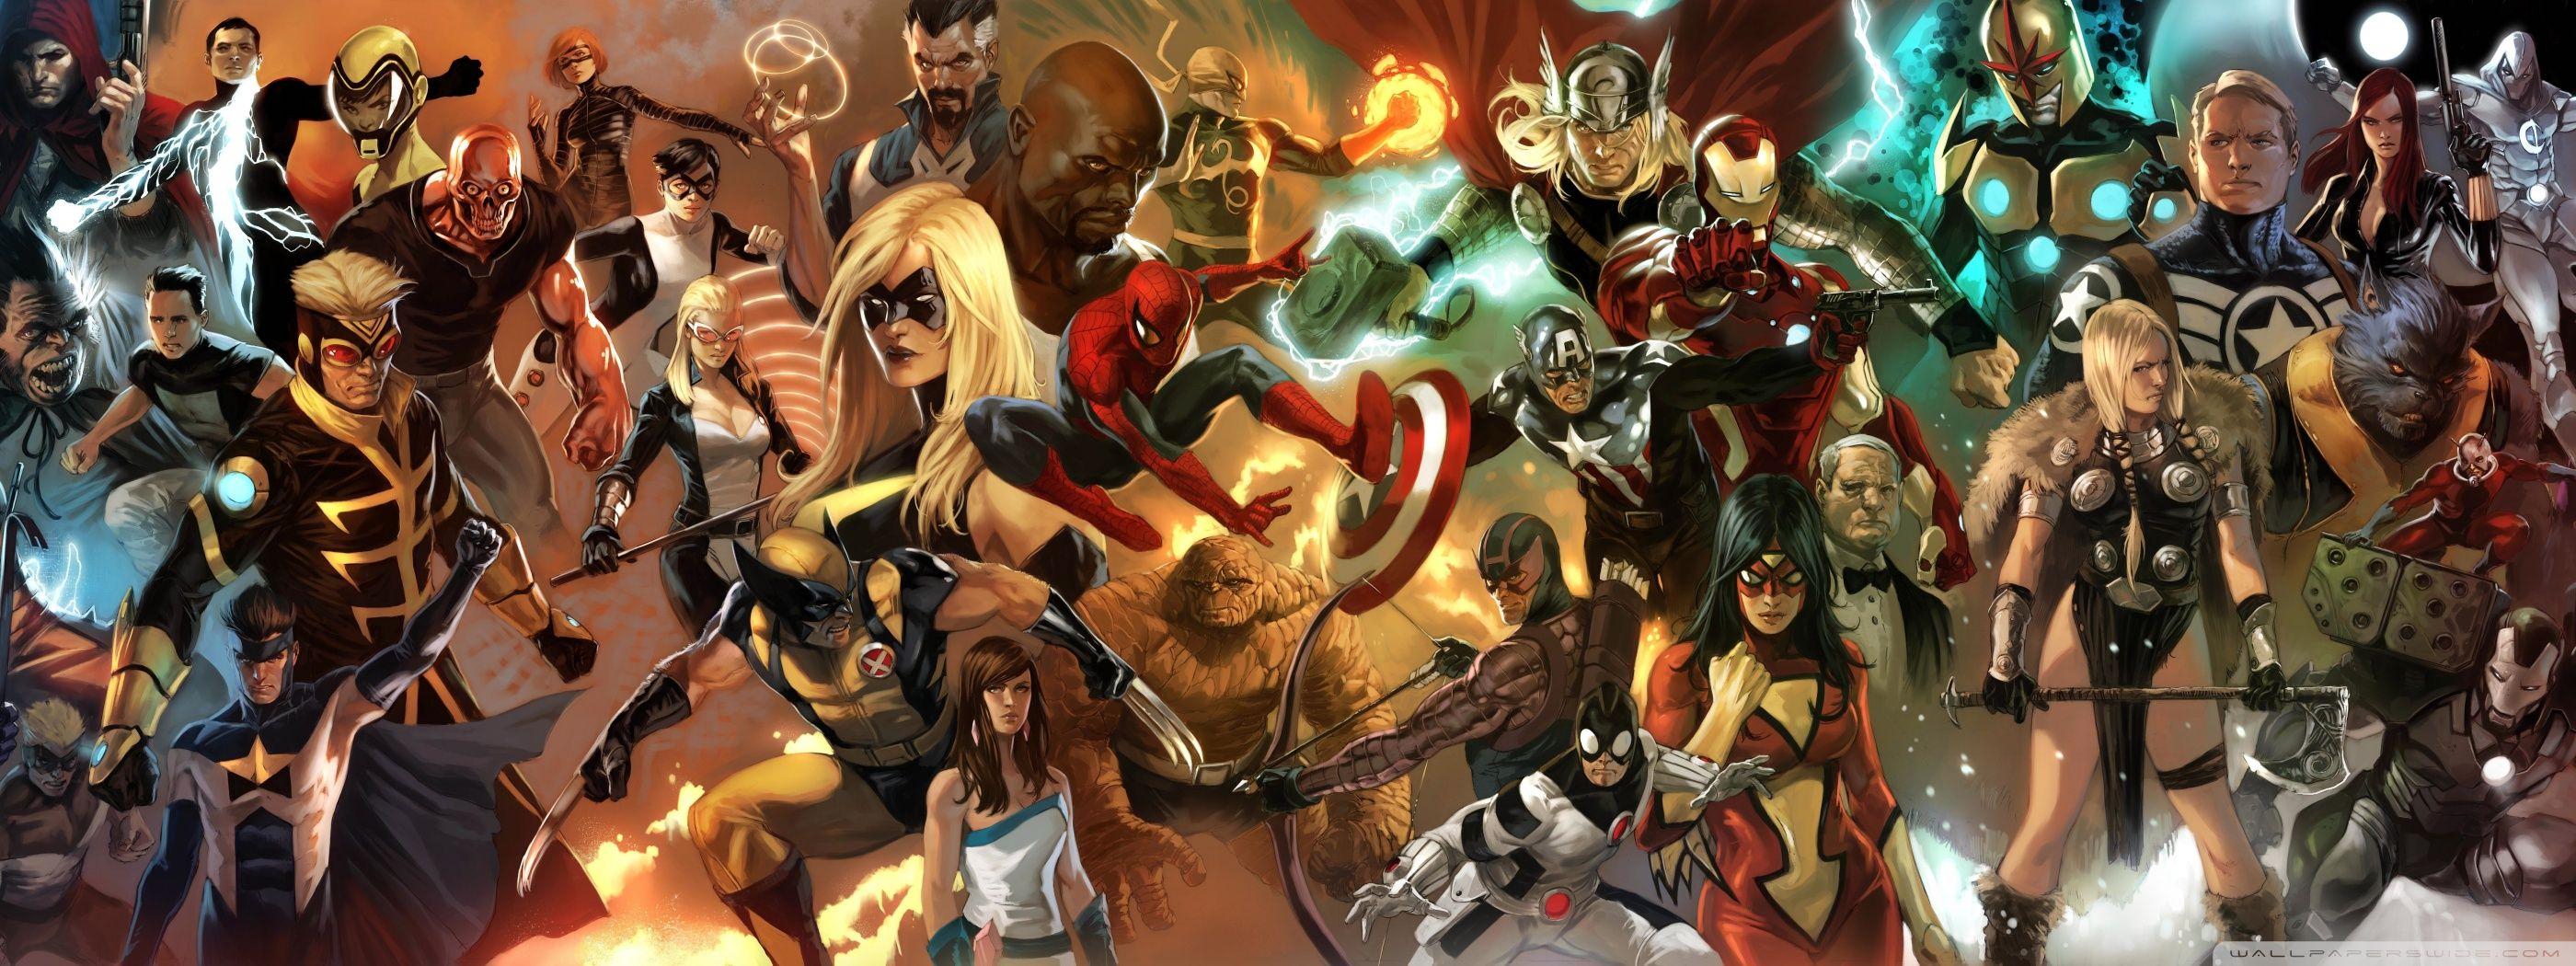 Marvel Comics Characters Hd Desktop Wallpaper Dual Monitor Superhero Poster Marvel Wallpaper Avengers Poster